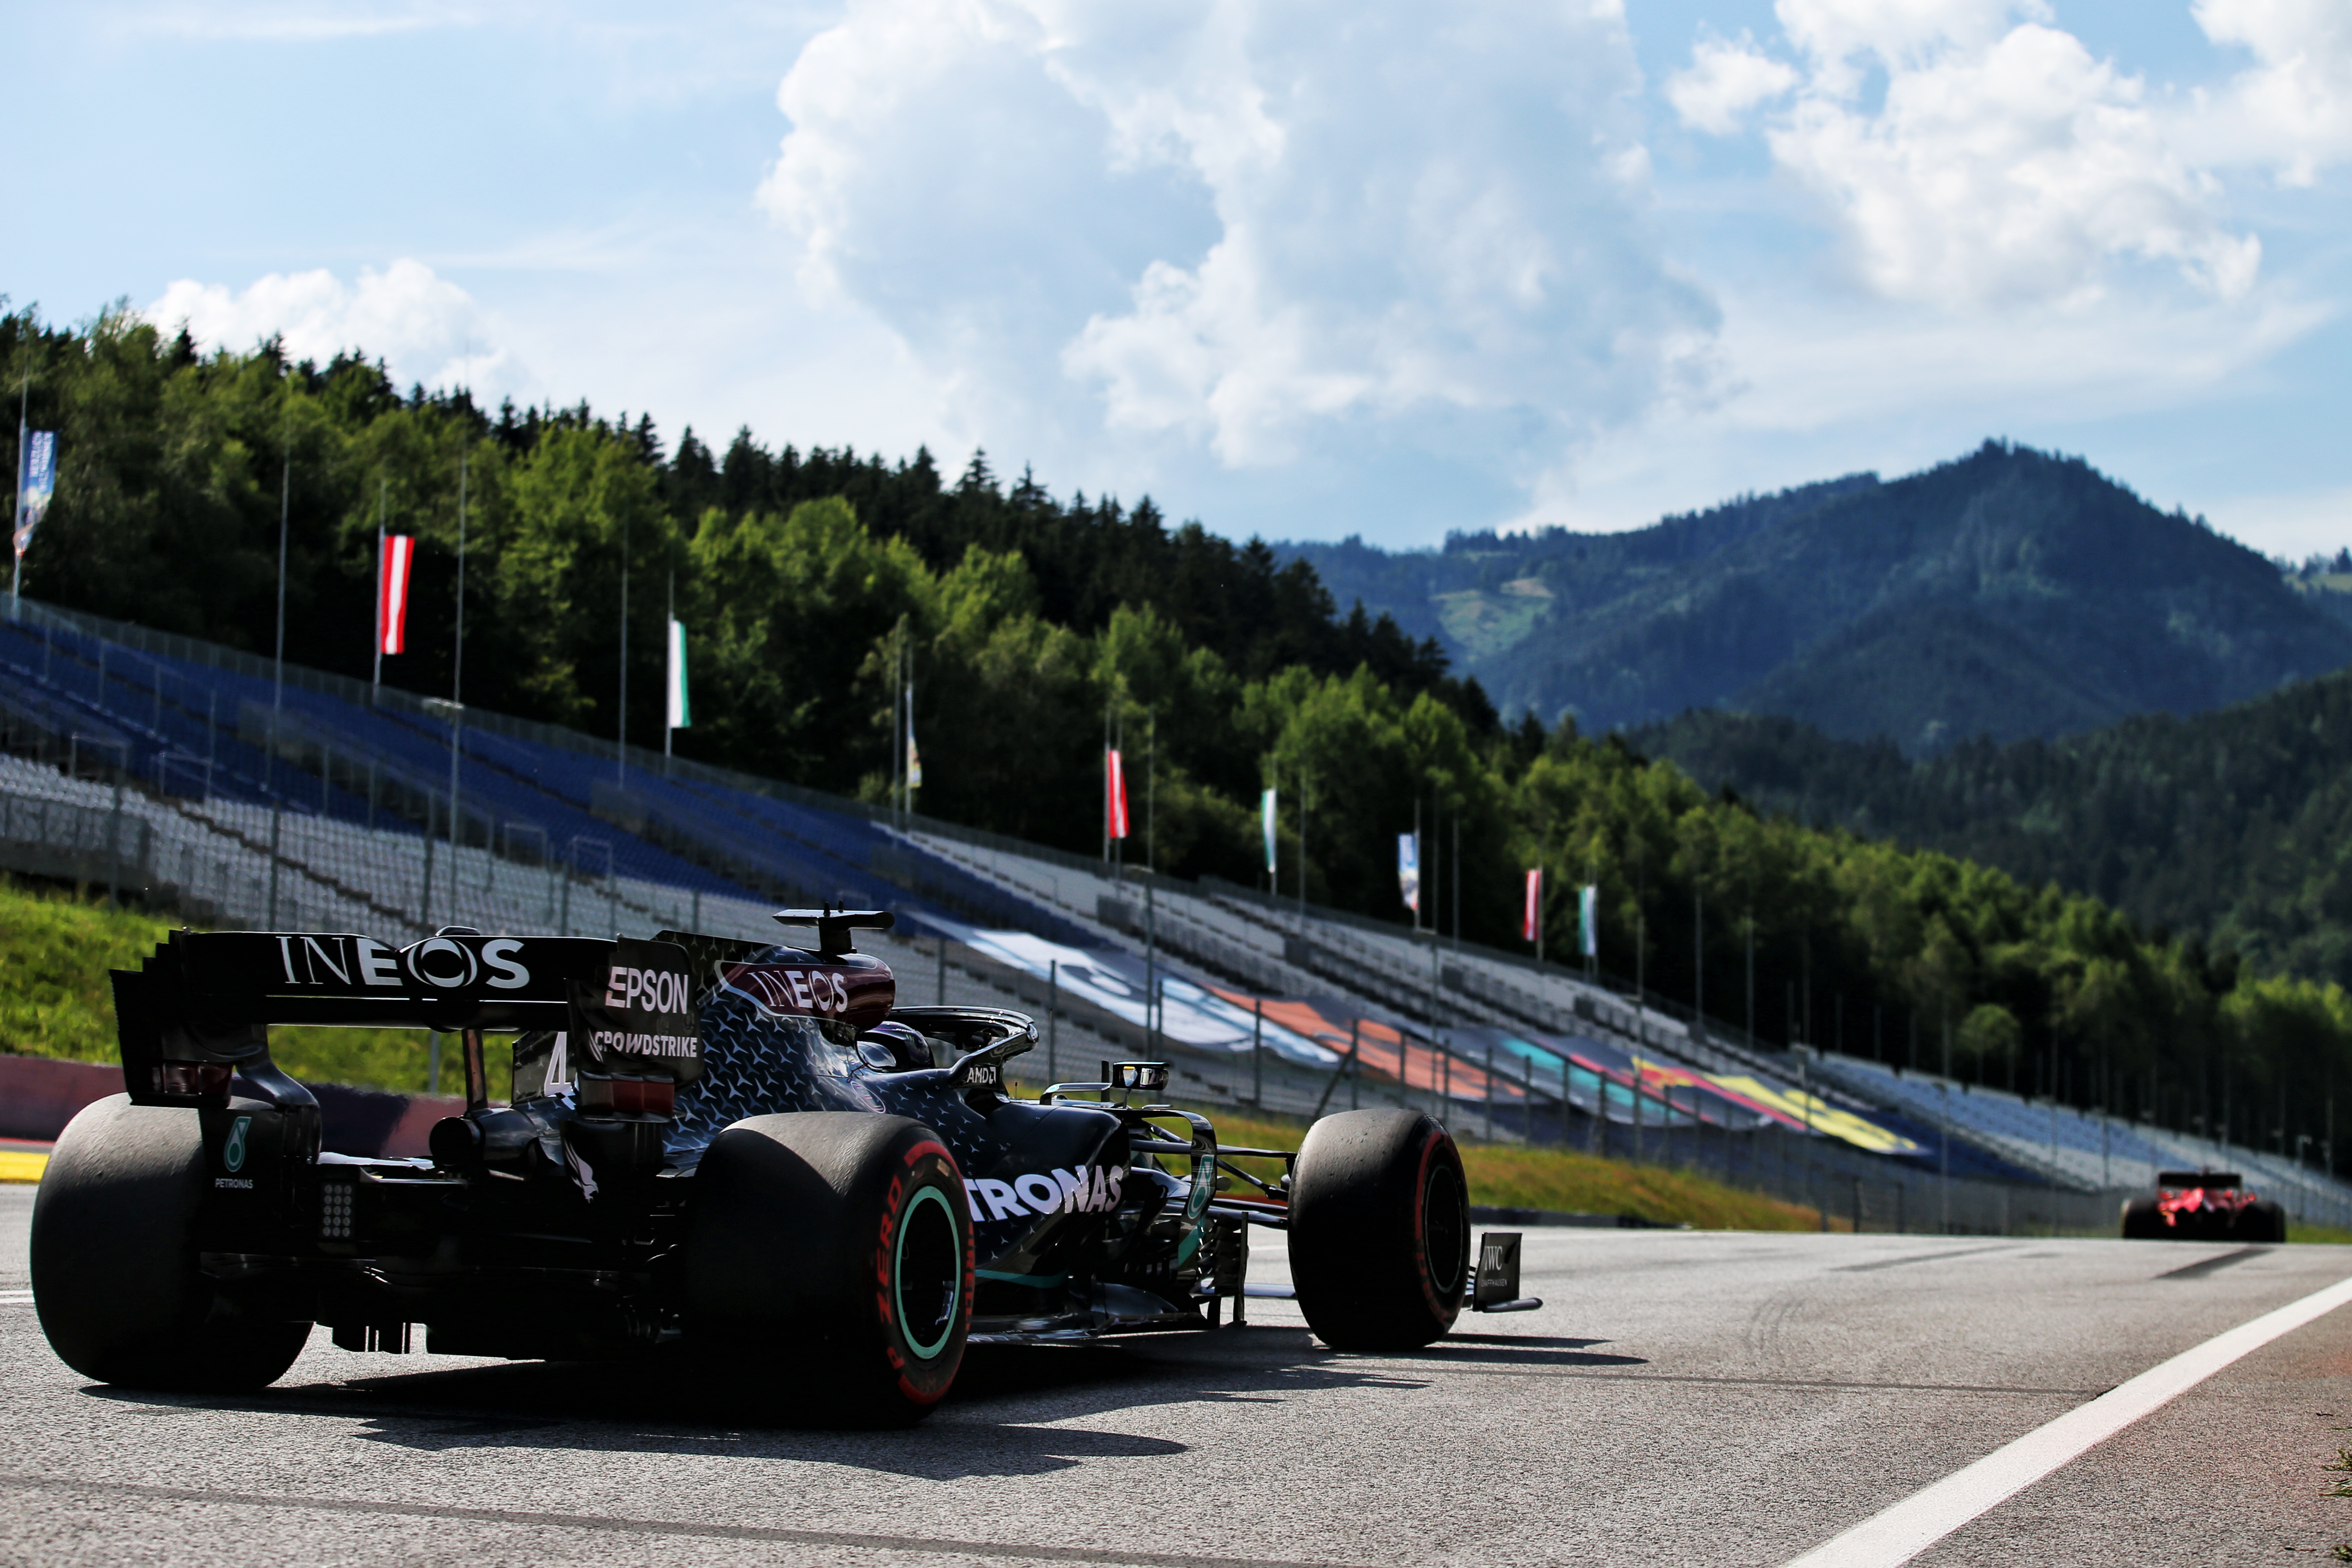 Lewis Hamilton Mercedes Styrian Grand Prix practice 2020